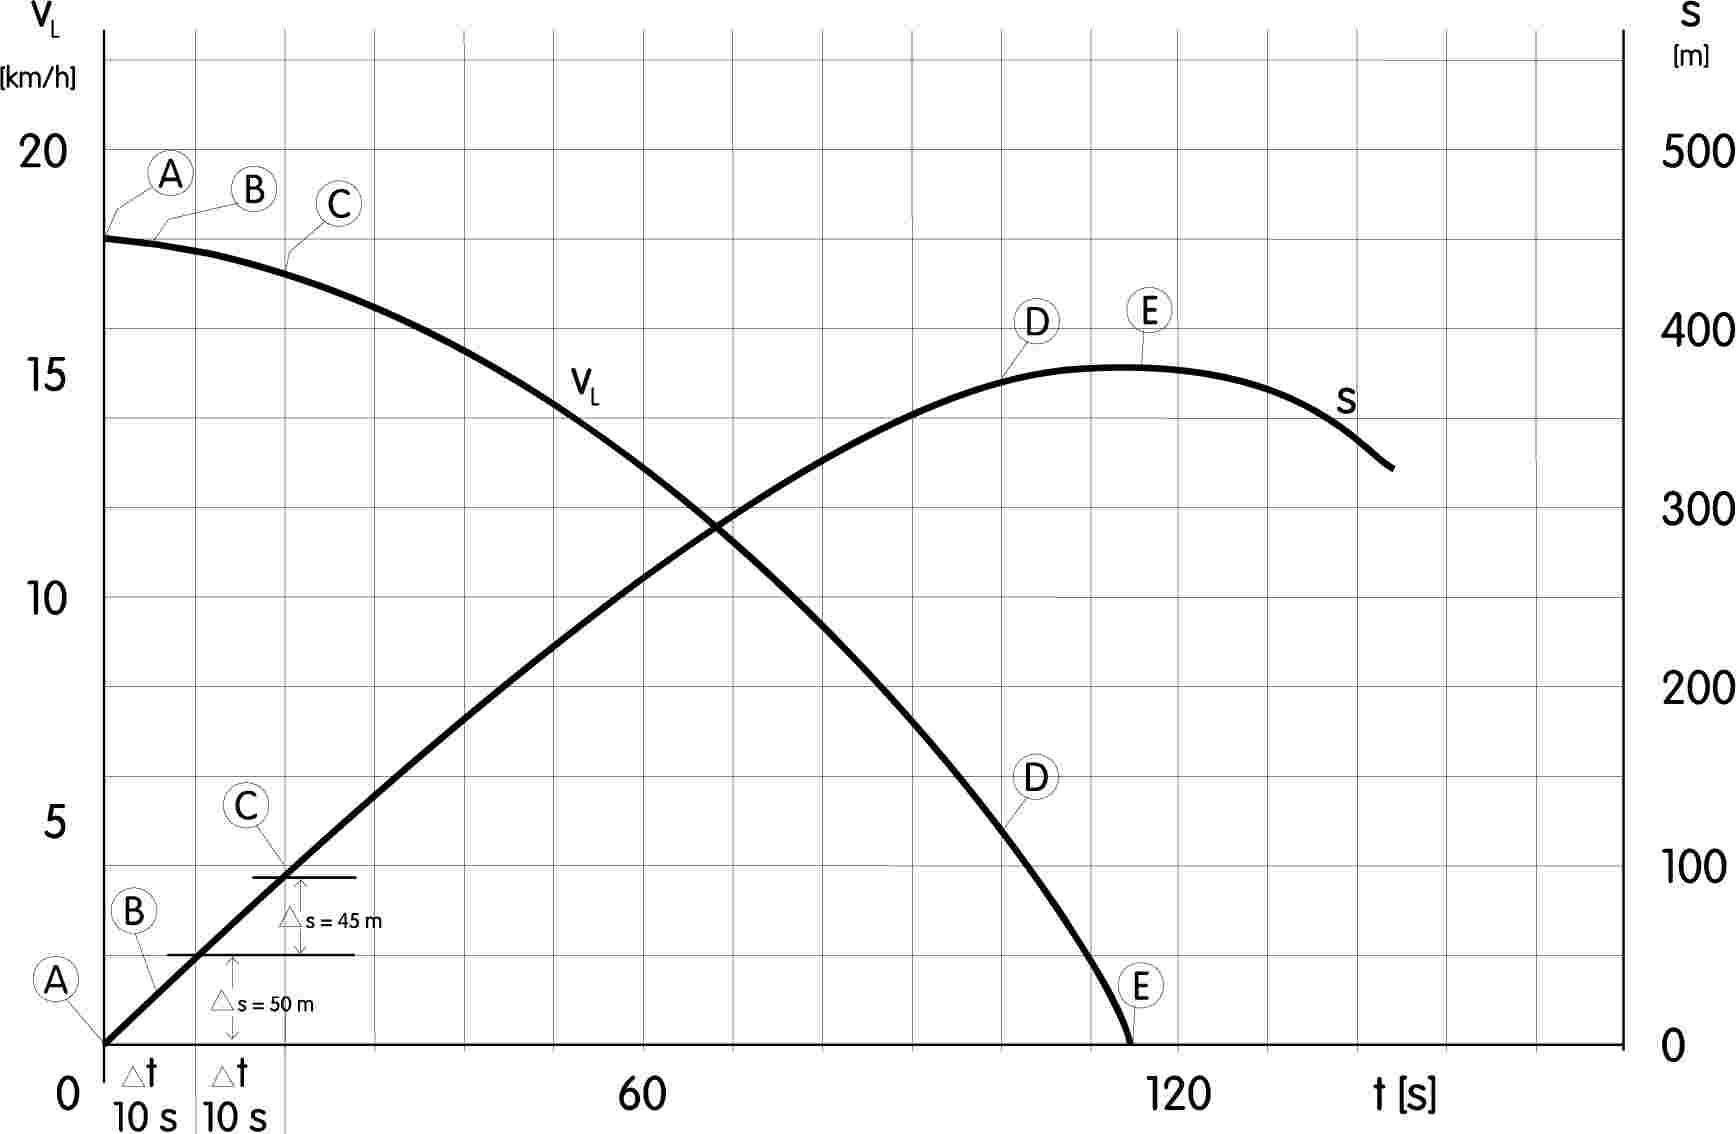 Eur Lex 02006l0087 20130701 En Bathroom Extractor Fan Wiring Diagram Furthermore Occupancy